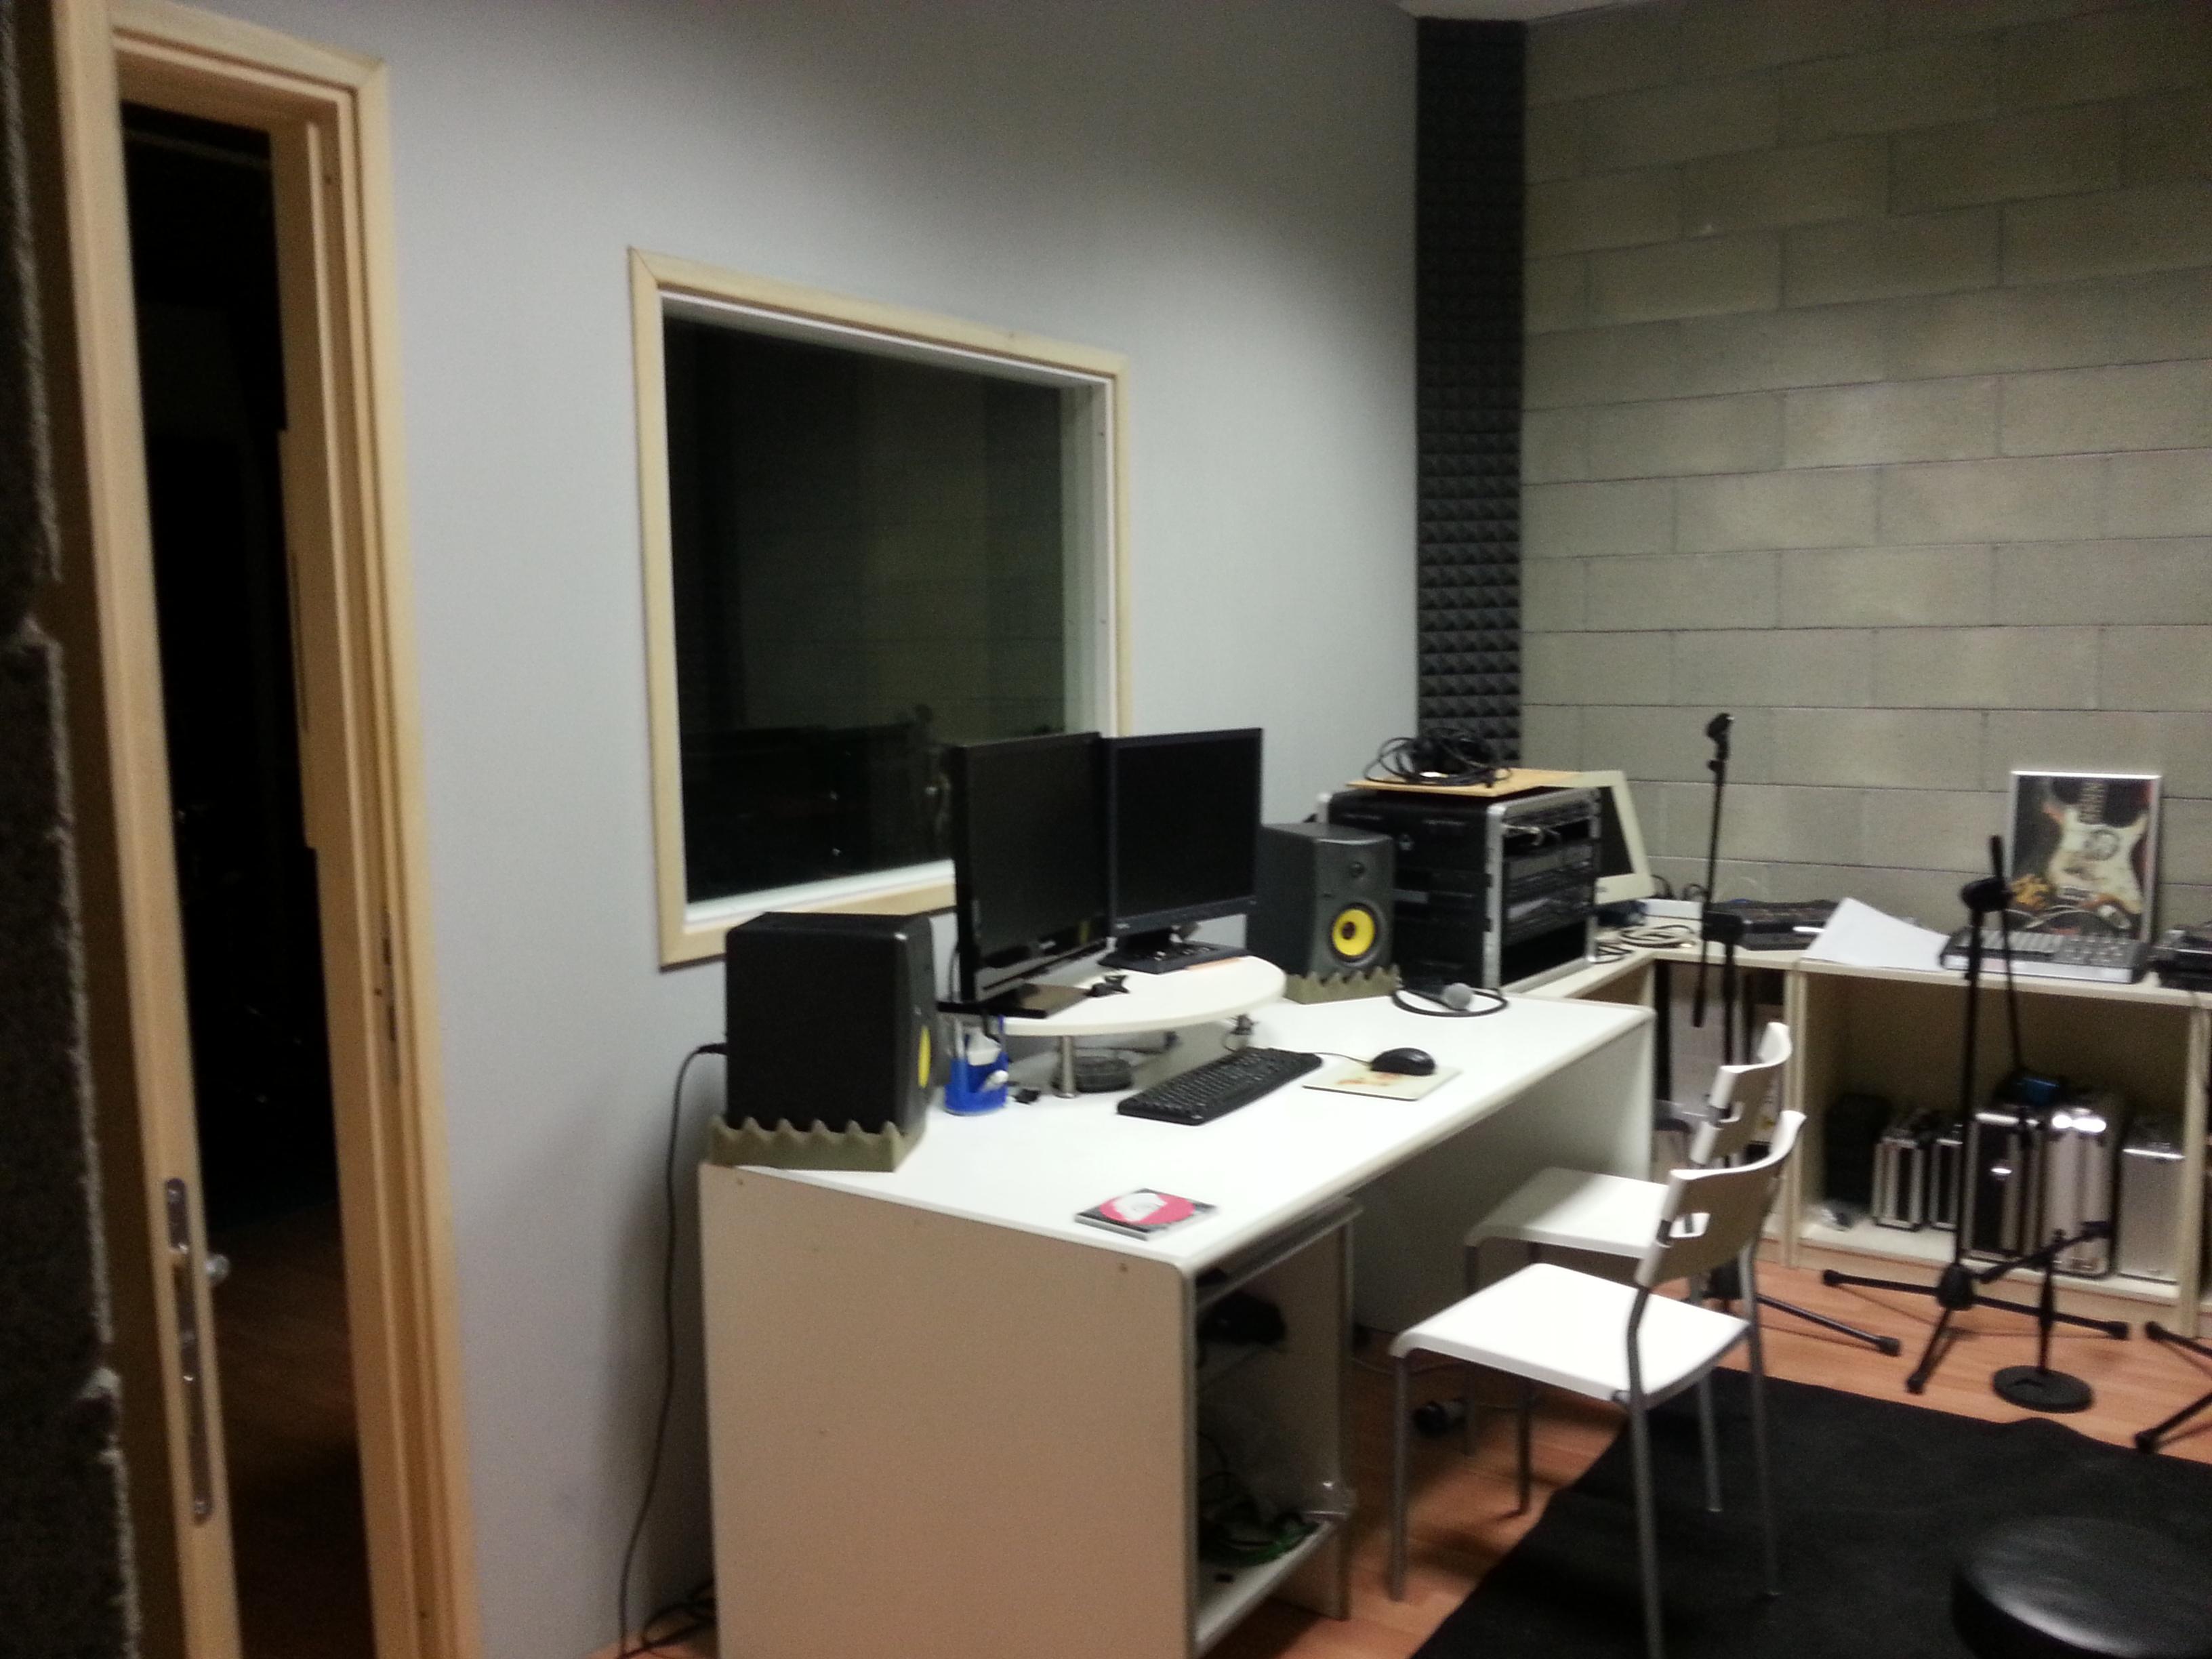 Studio di registrazione m4a lab - Studio di registrazione casalingo ...